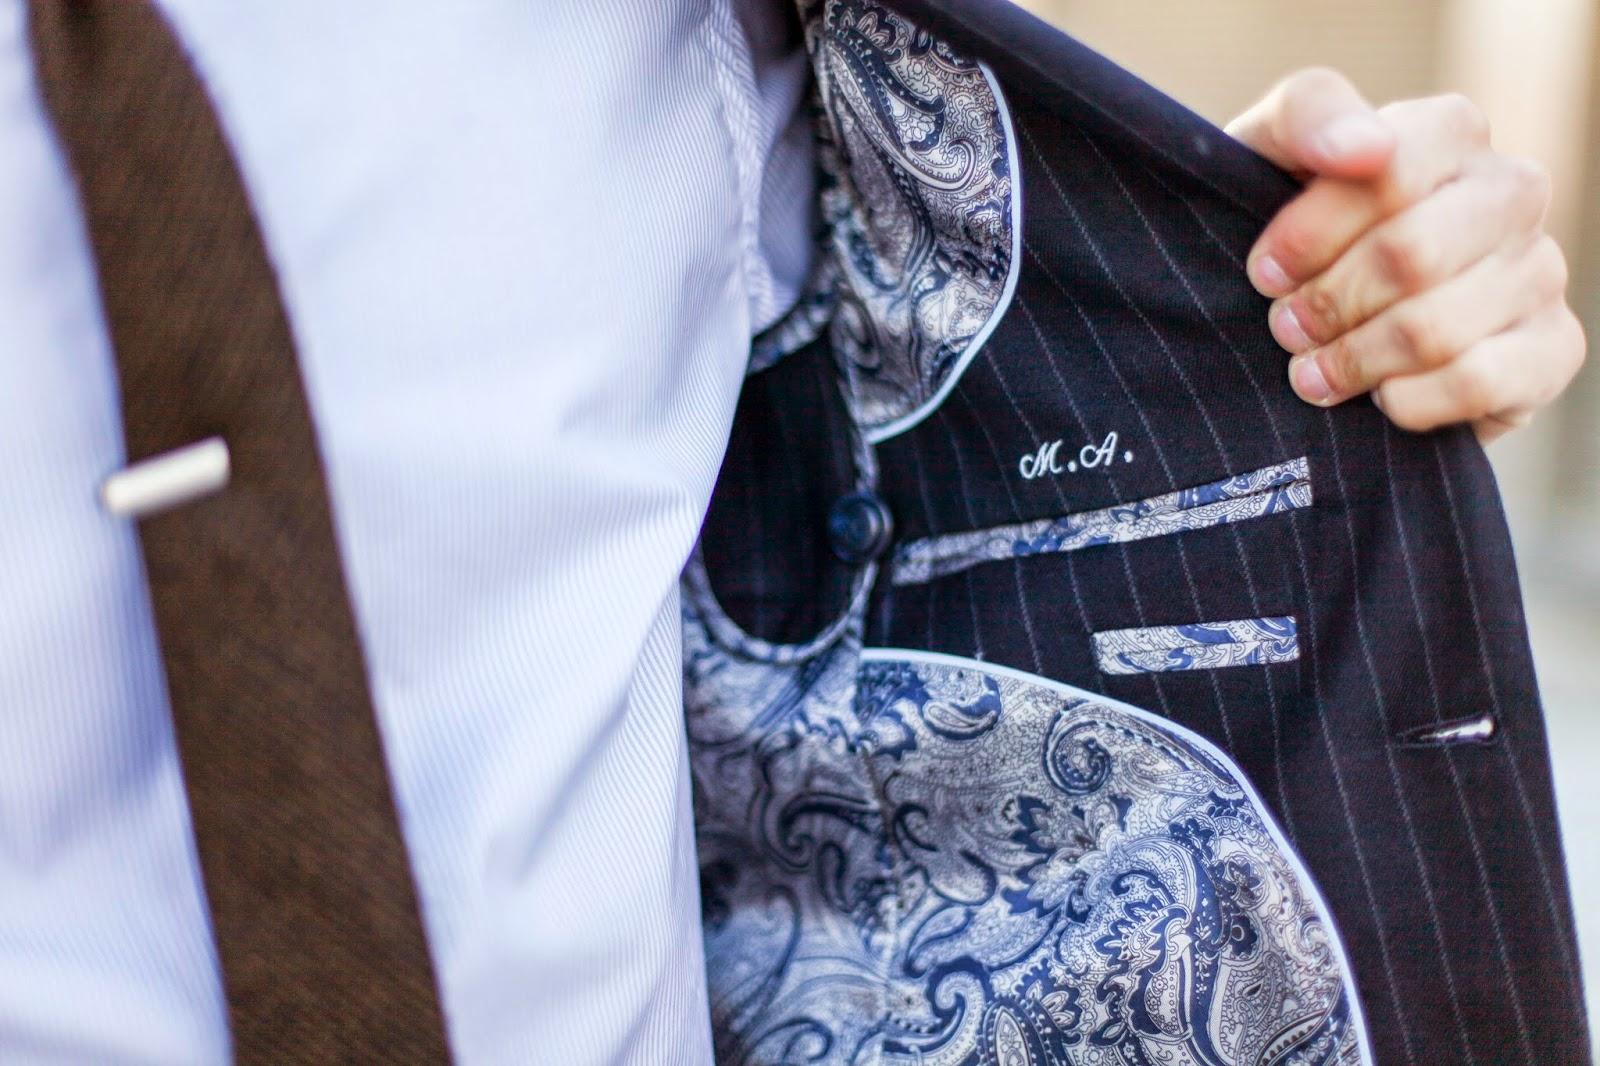 Born To Tailor Bespoke Custom Tailor Suits New York Varun Gandhi 10.JPG